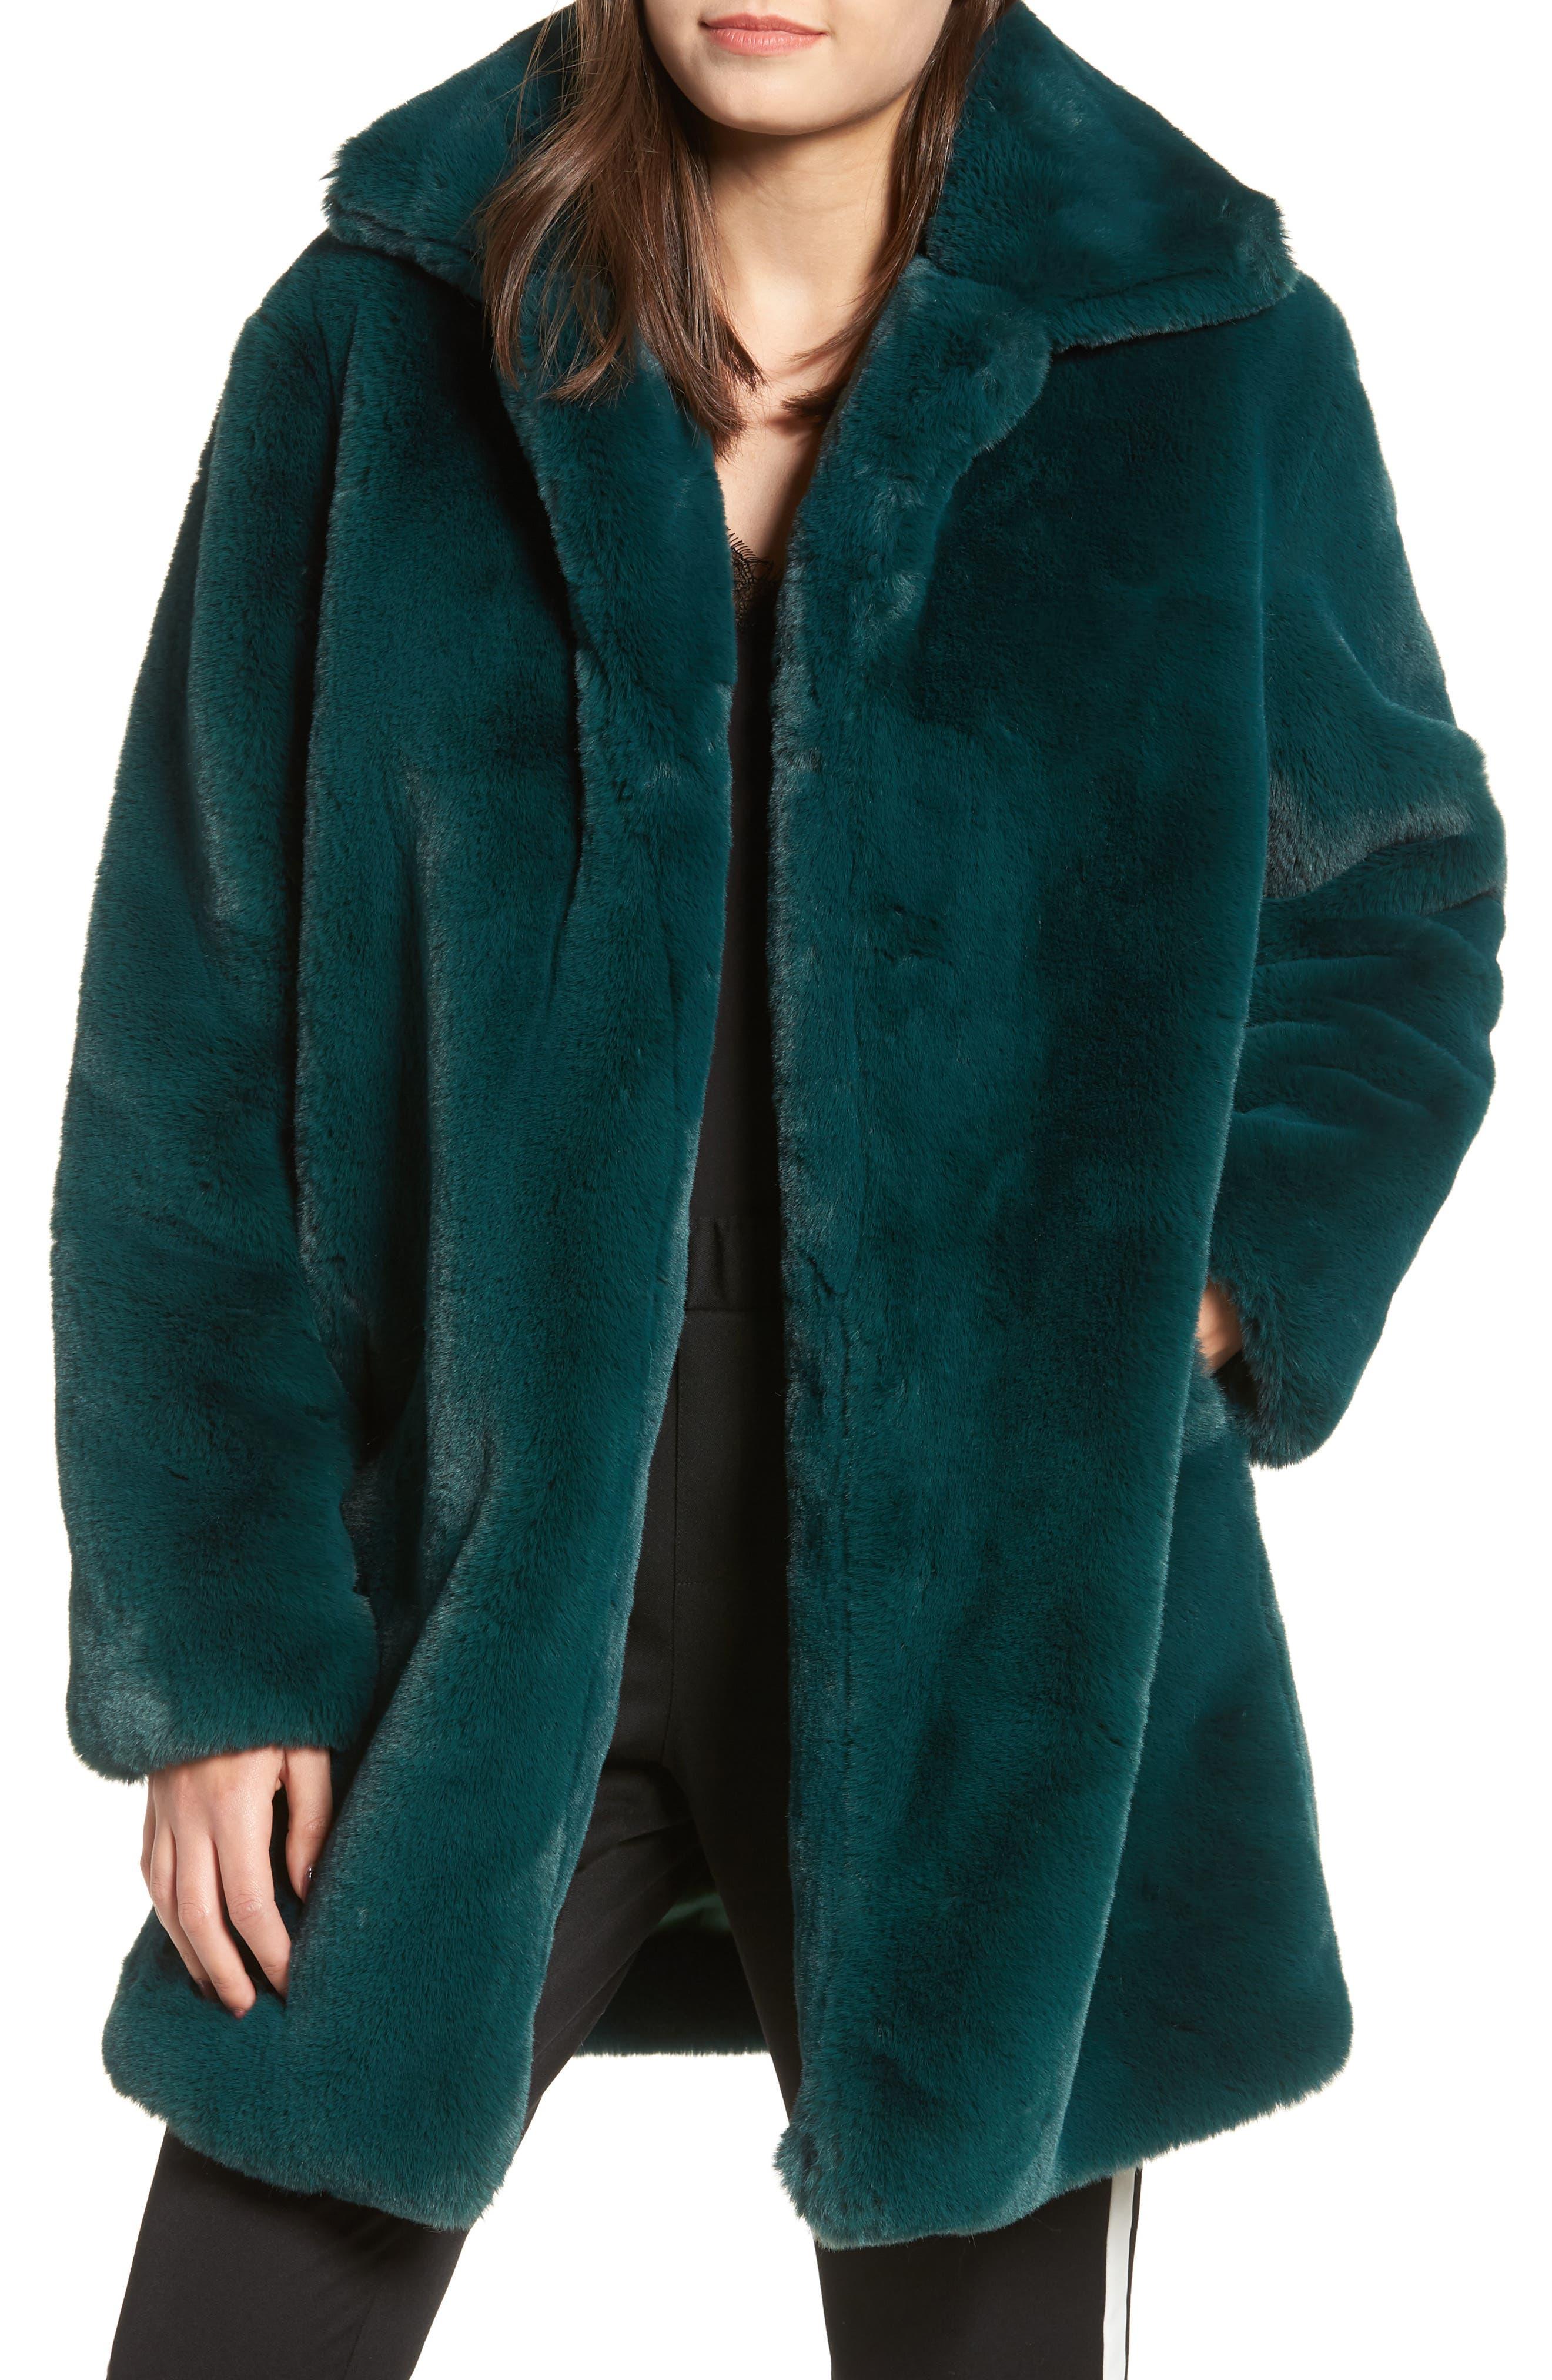 Dreaming Faux Fur Coat,                             Main thumbnail 1, color,                             300